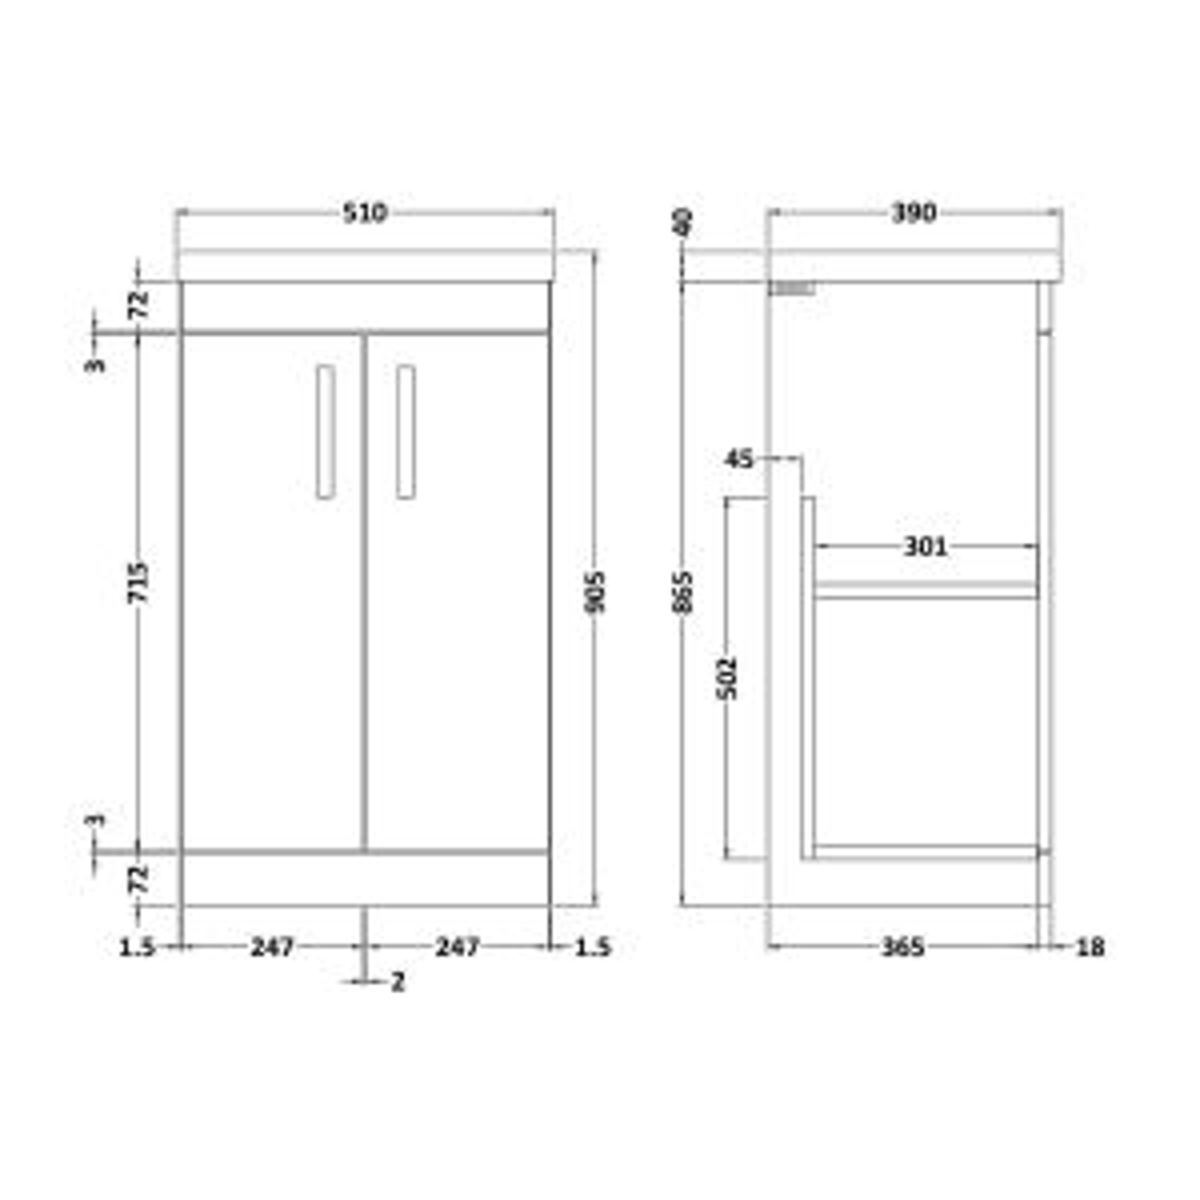 Nuie Athena Natural Oak 2 Door Floor Standing Vanity Unit with 40mm Profile Basin 500mm Line Drawing